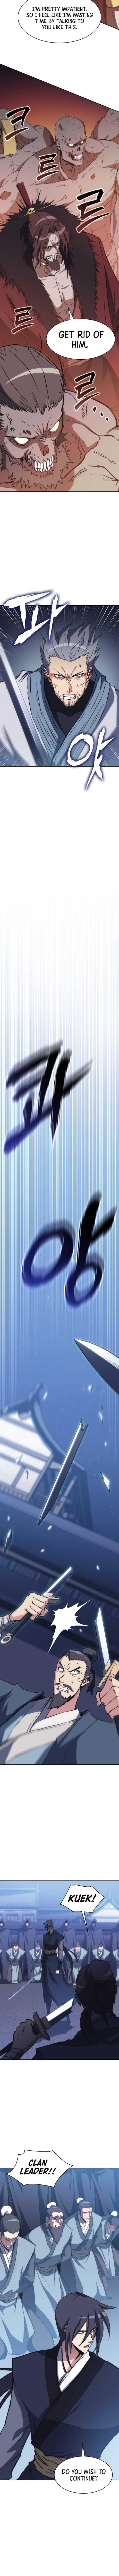 Mukhyang The Origin - chapter 42-eng-li